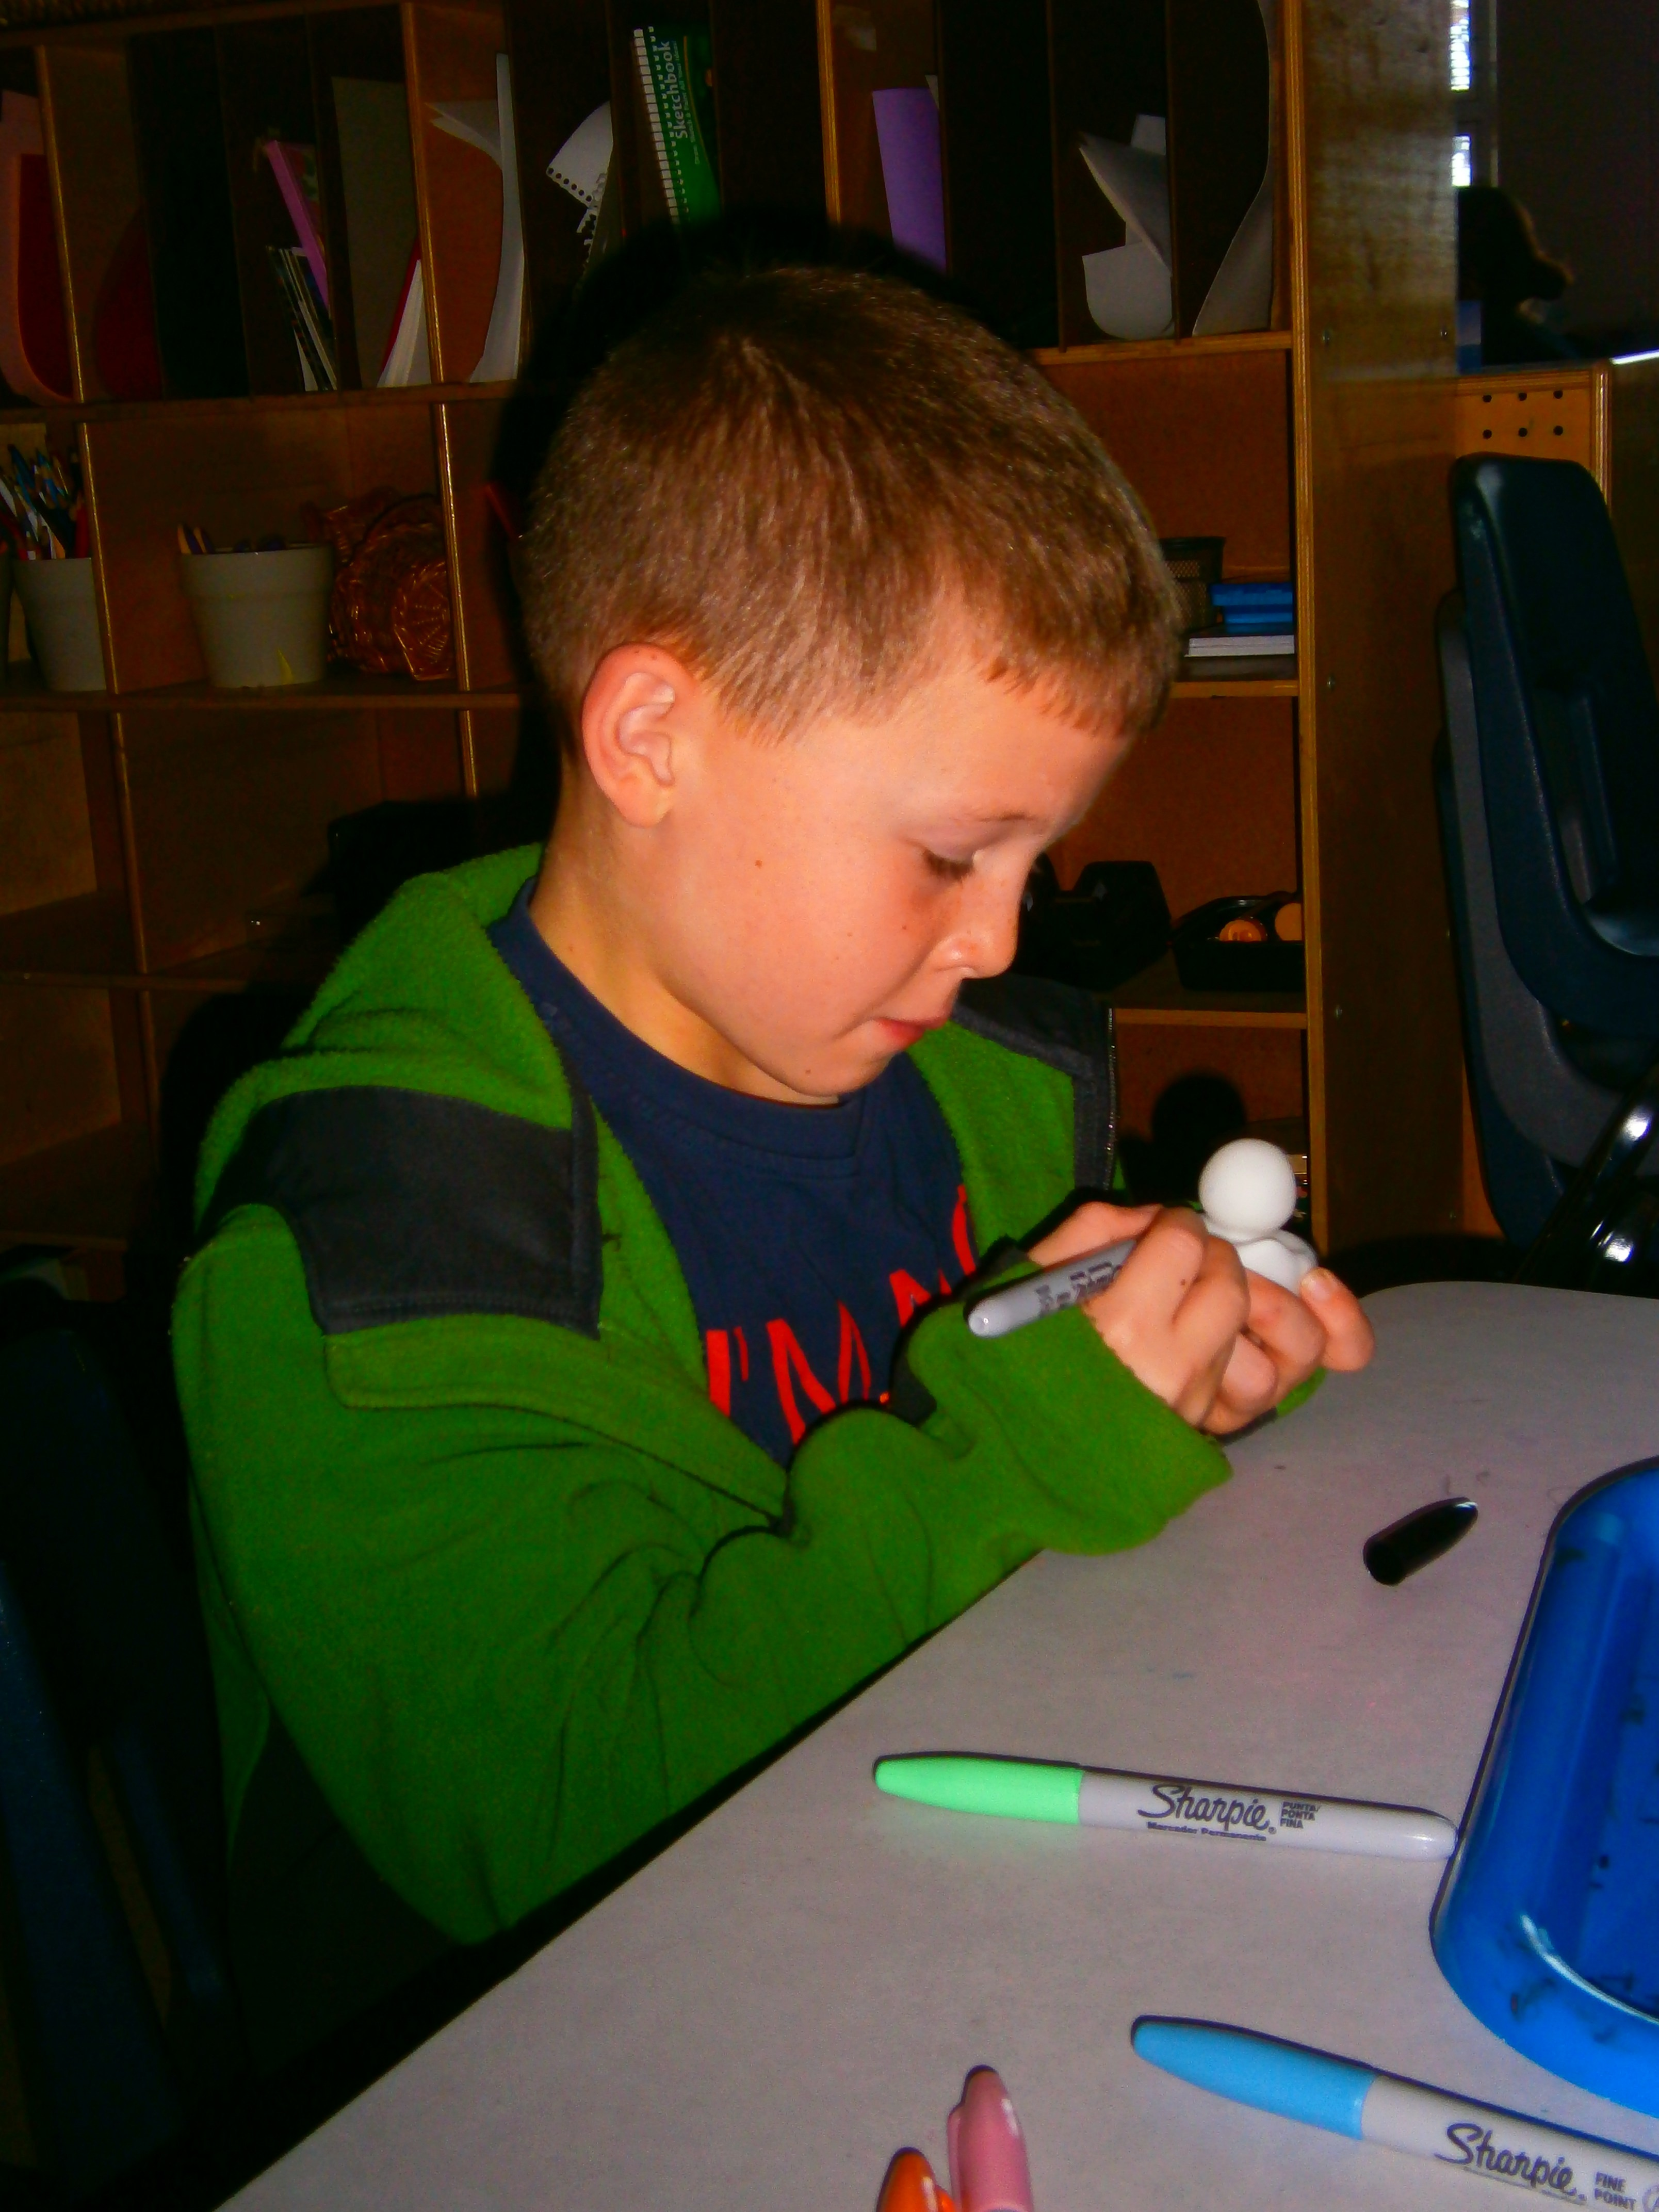 Boy creating a winter craft.